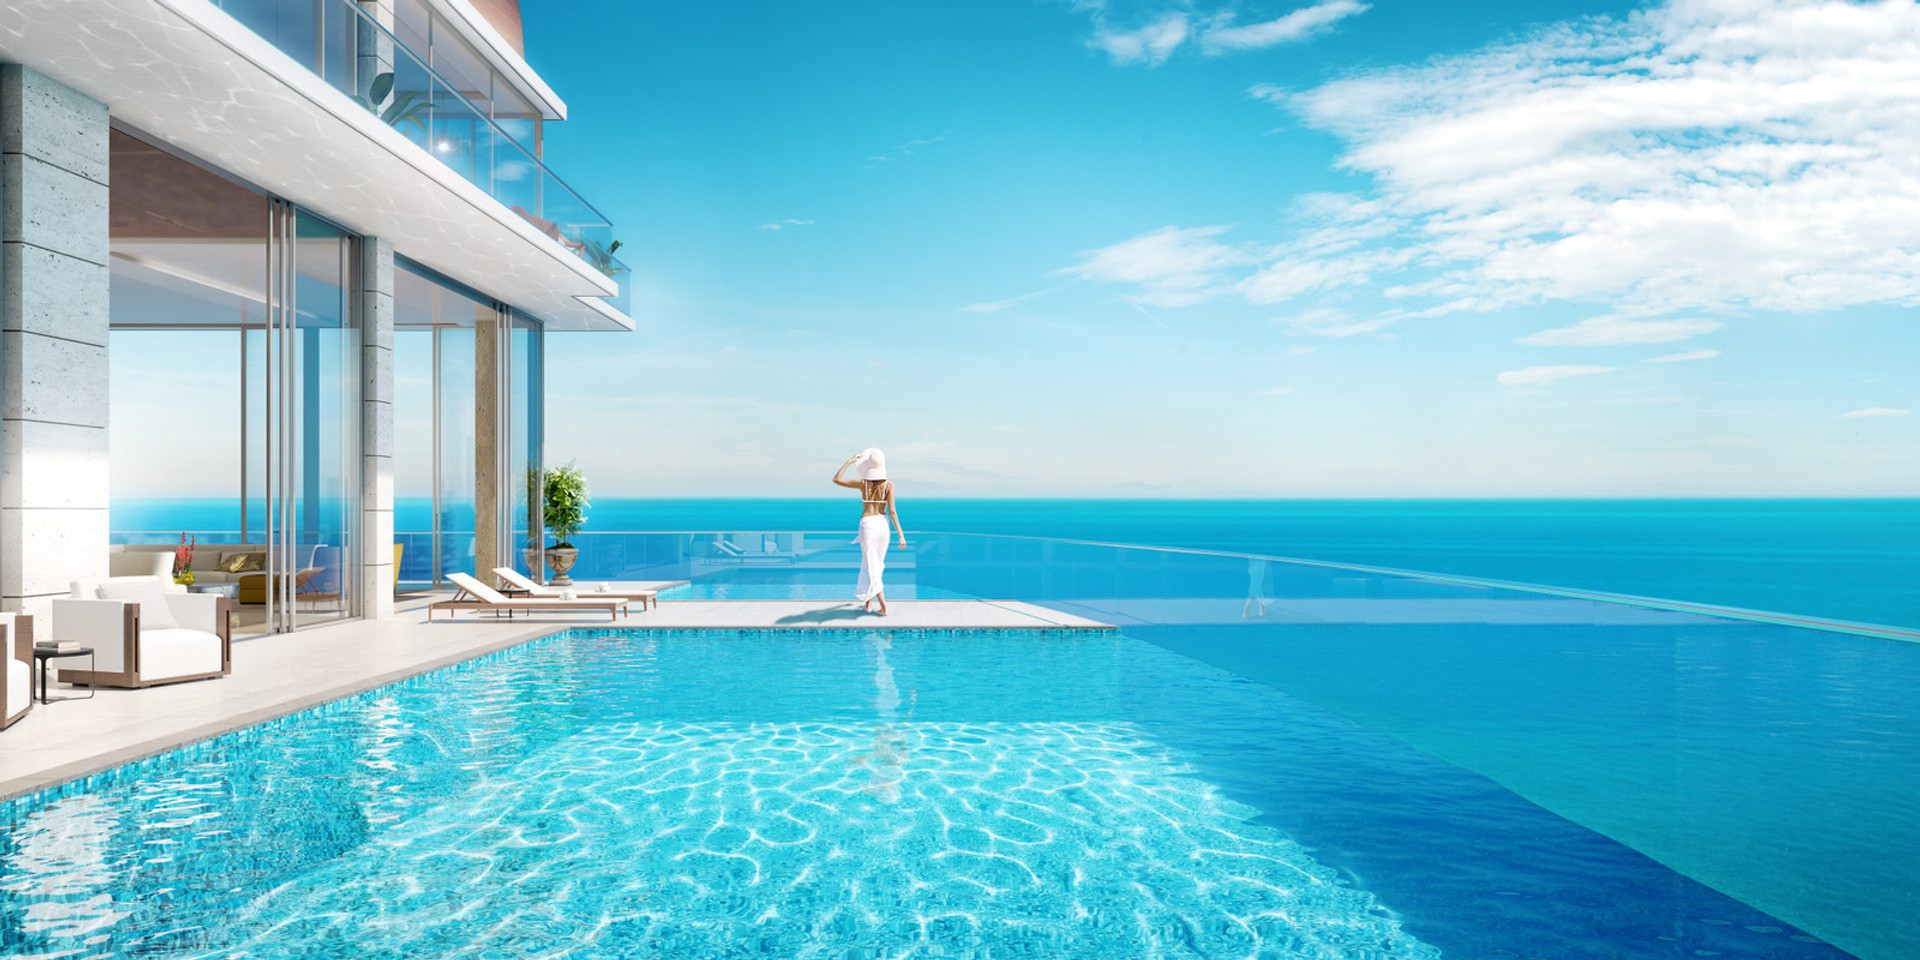 Casa del Mare pool